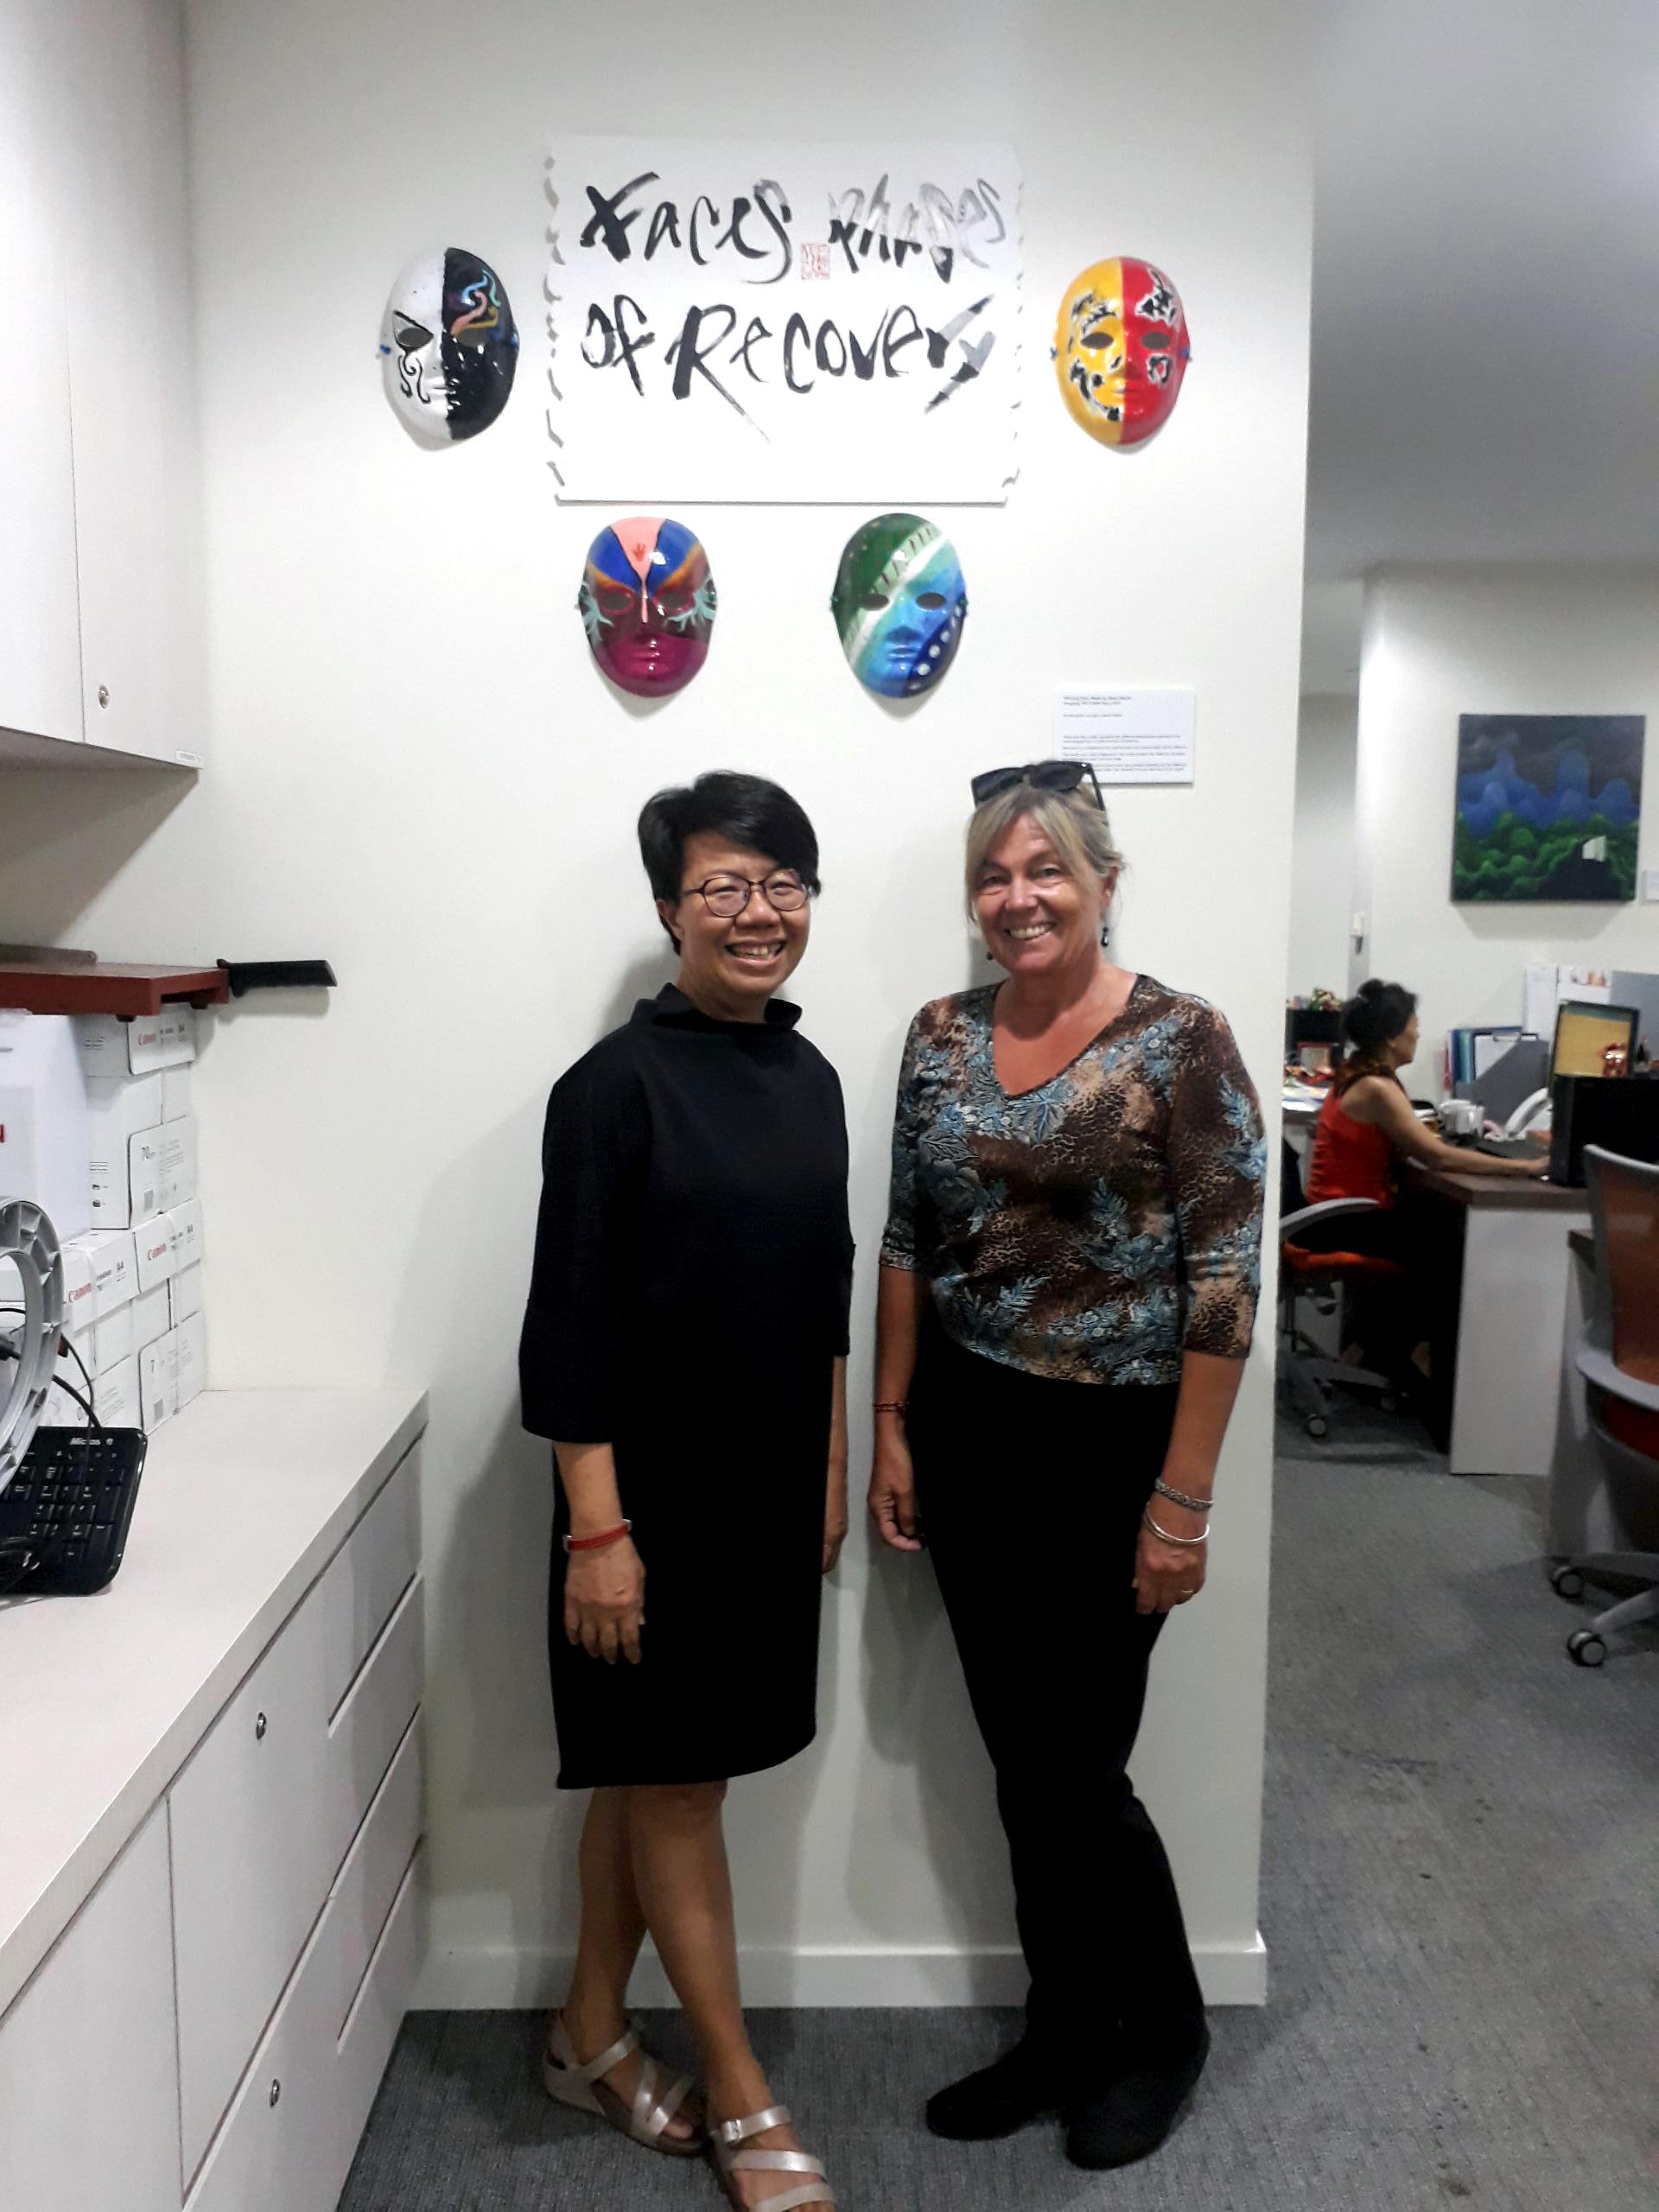 Kim-McCreanor-SMART-Recovery-Singapore.jpg